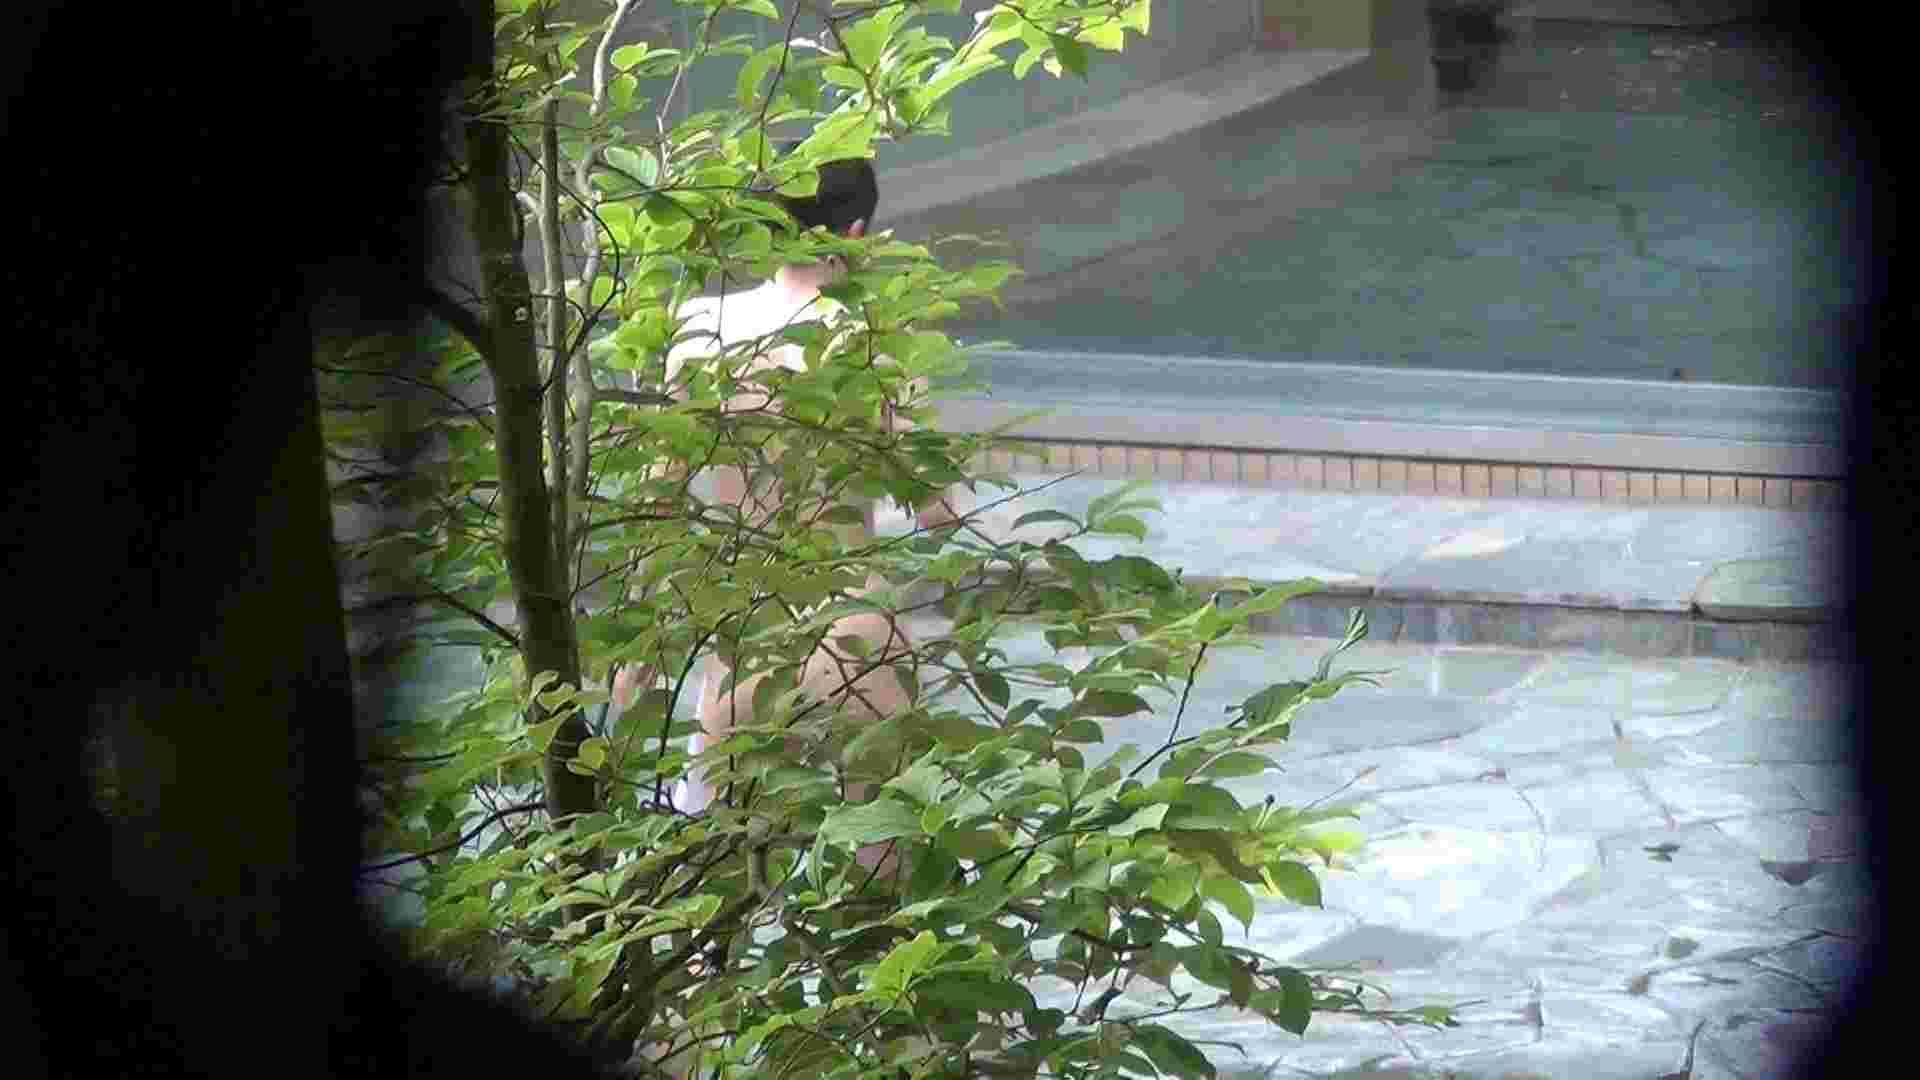 Vol.66 血縁関係三人の裸体鑑賞 タオルが憎い 露天風呂の女子達 AV無料動画キャプチャ 22画像 19